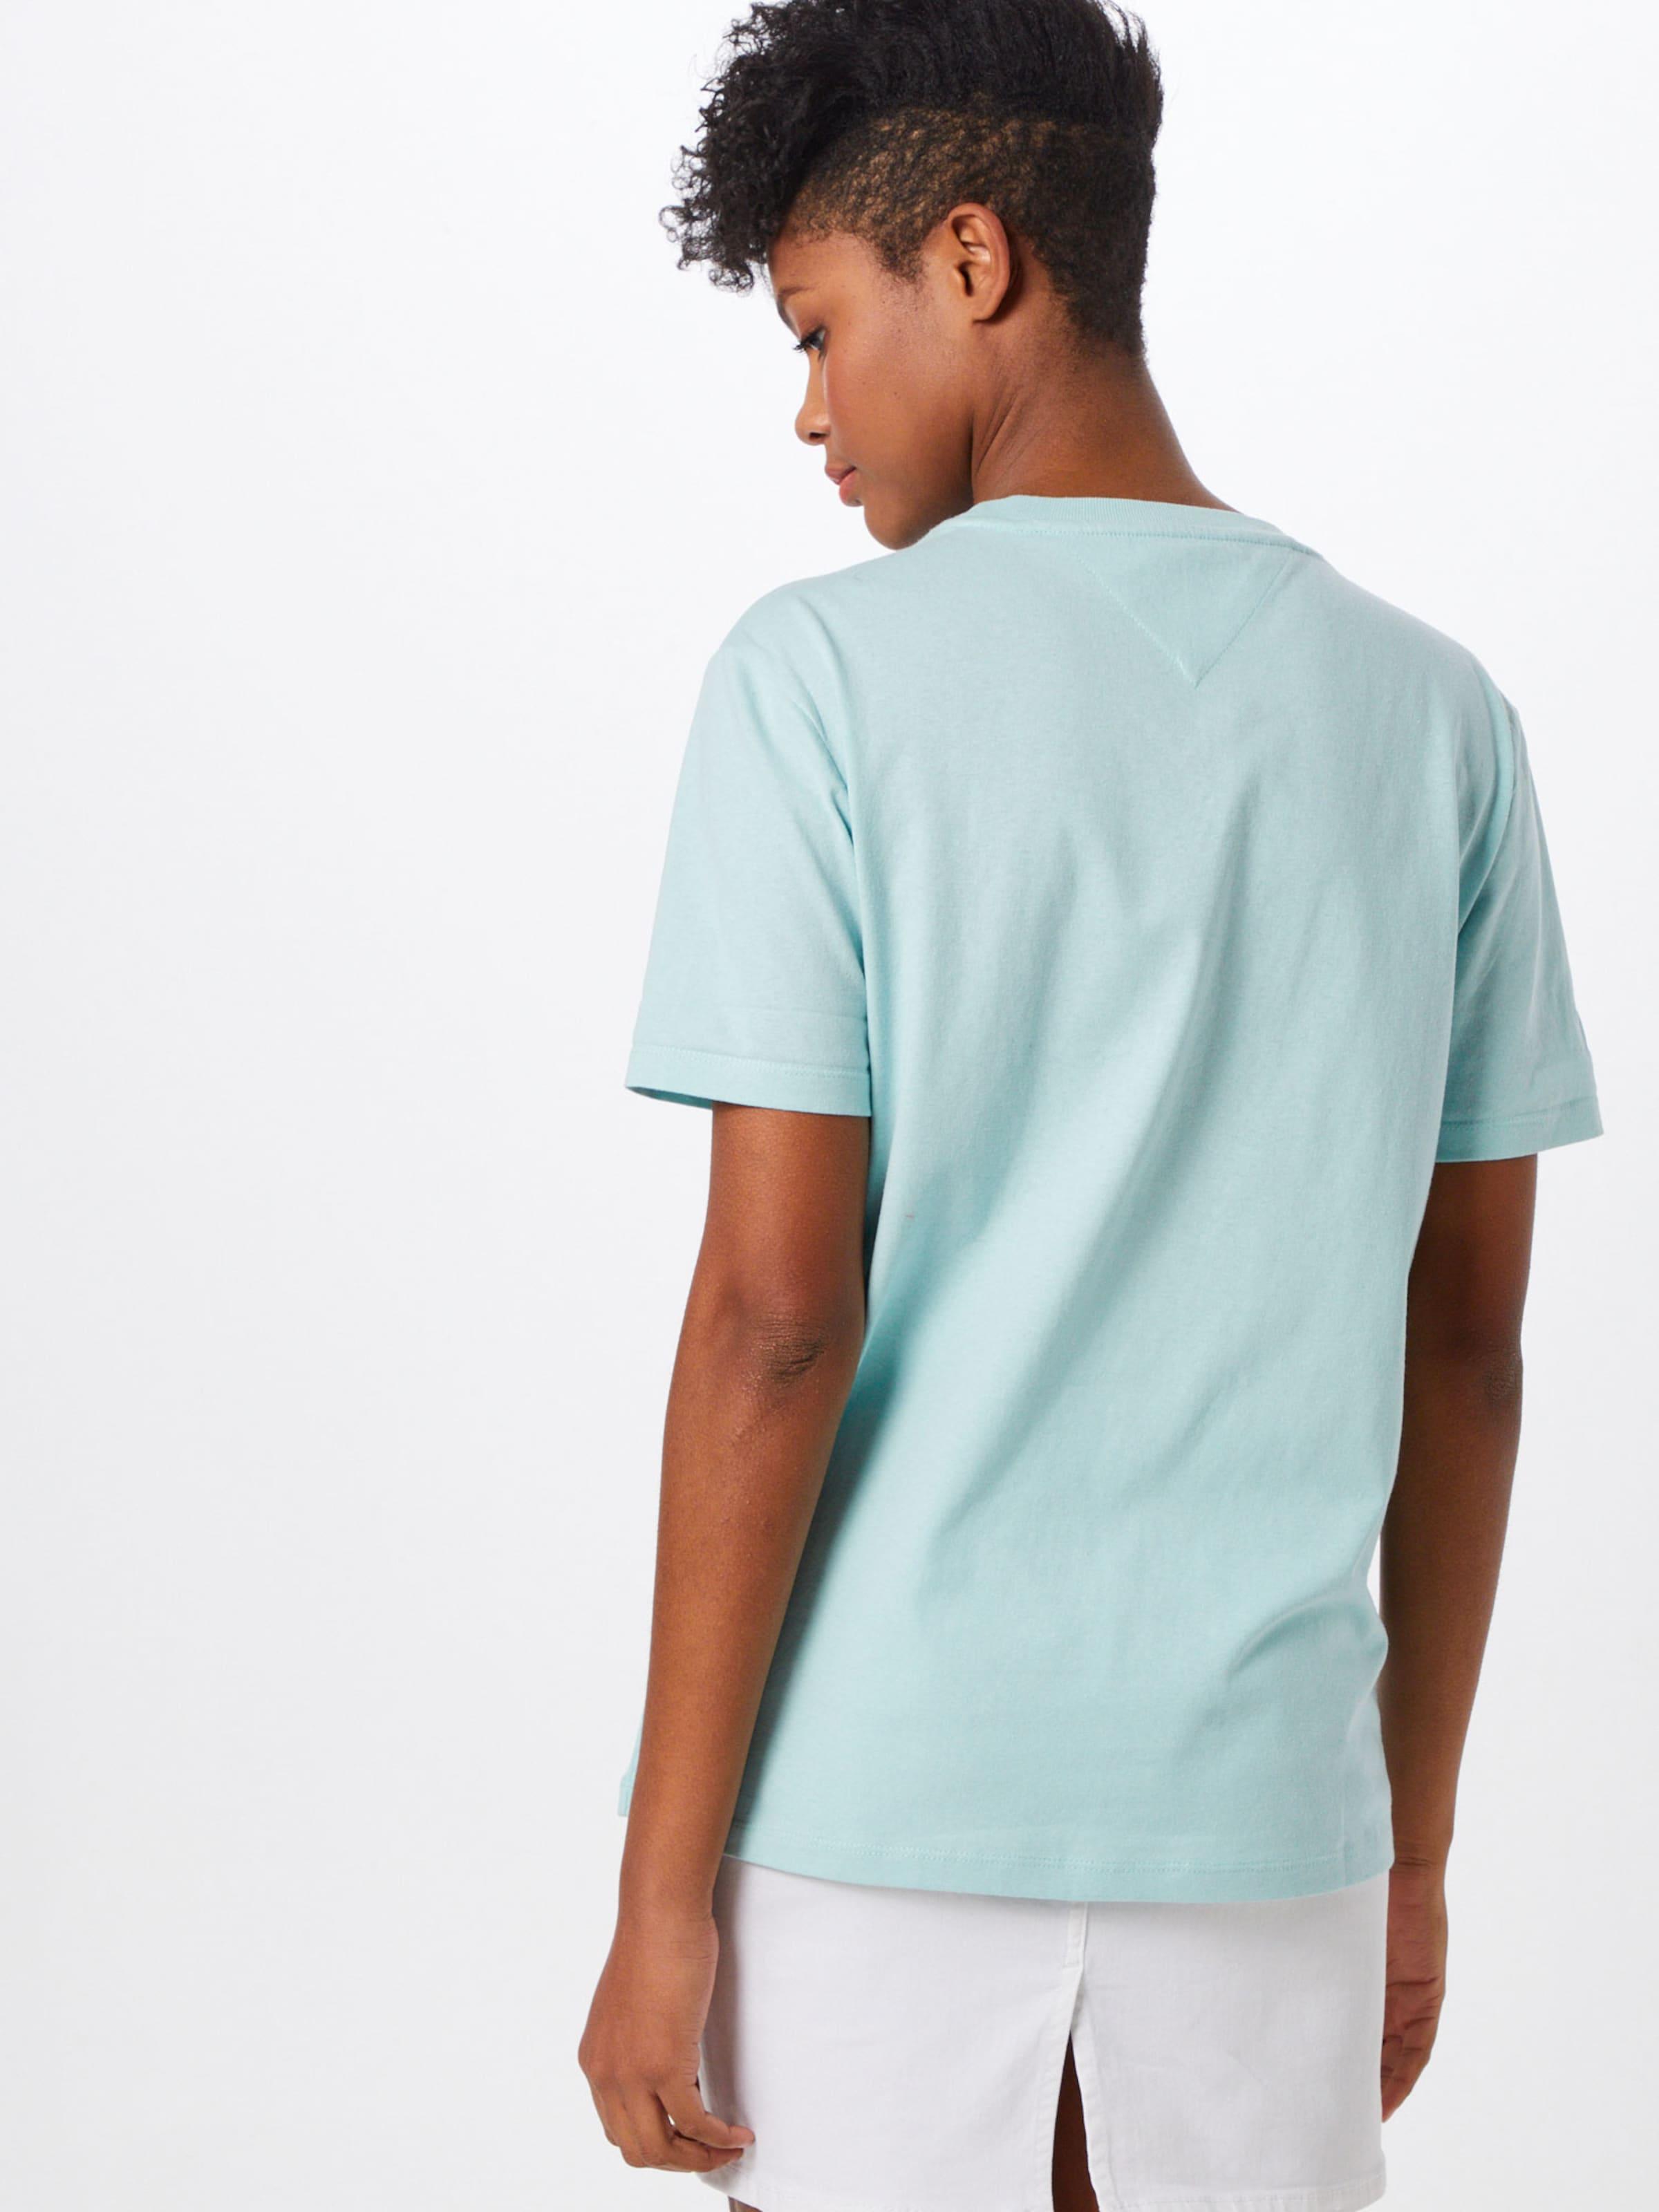 Tommy Jeans HellblauMischfarben Tommy Shirt In 0wNnXk8PZO